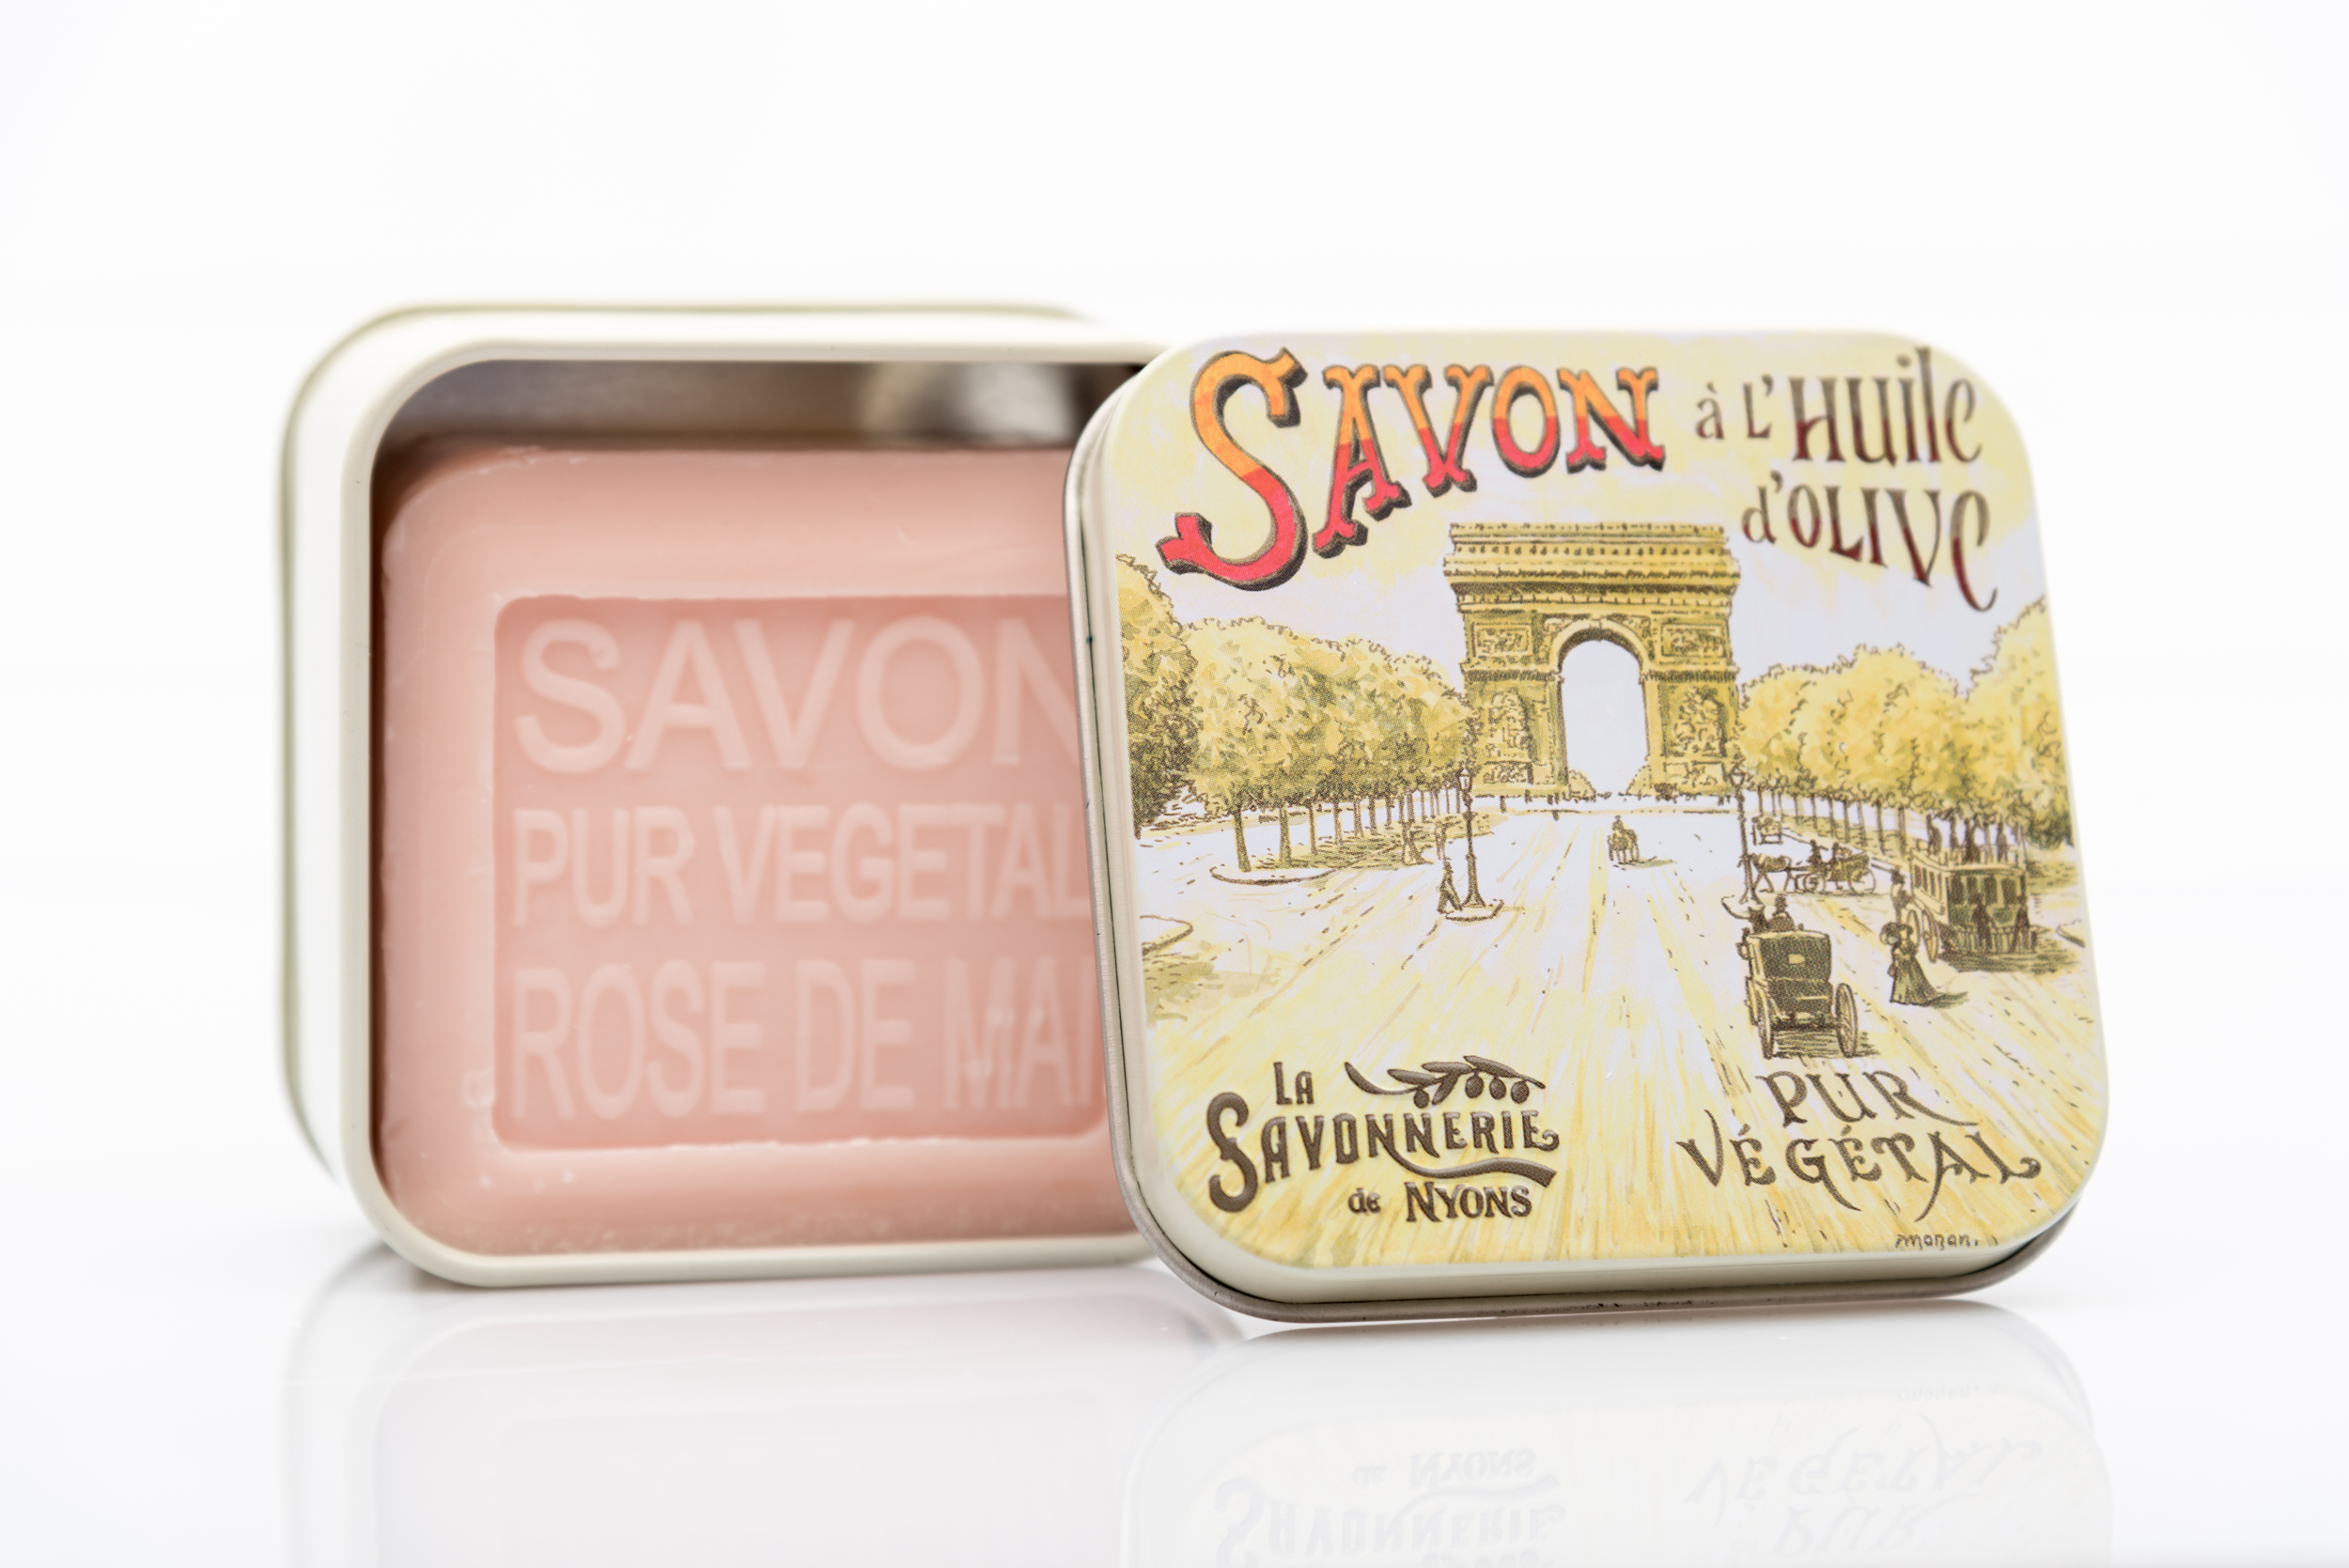 SAVON DE NYONS VEGETAL MADE IN FRANCE AVEC BOITE METALIQUE MODELE 47 A LA ROSE DE MAI